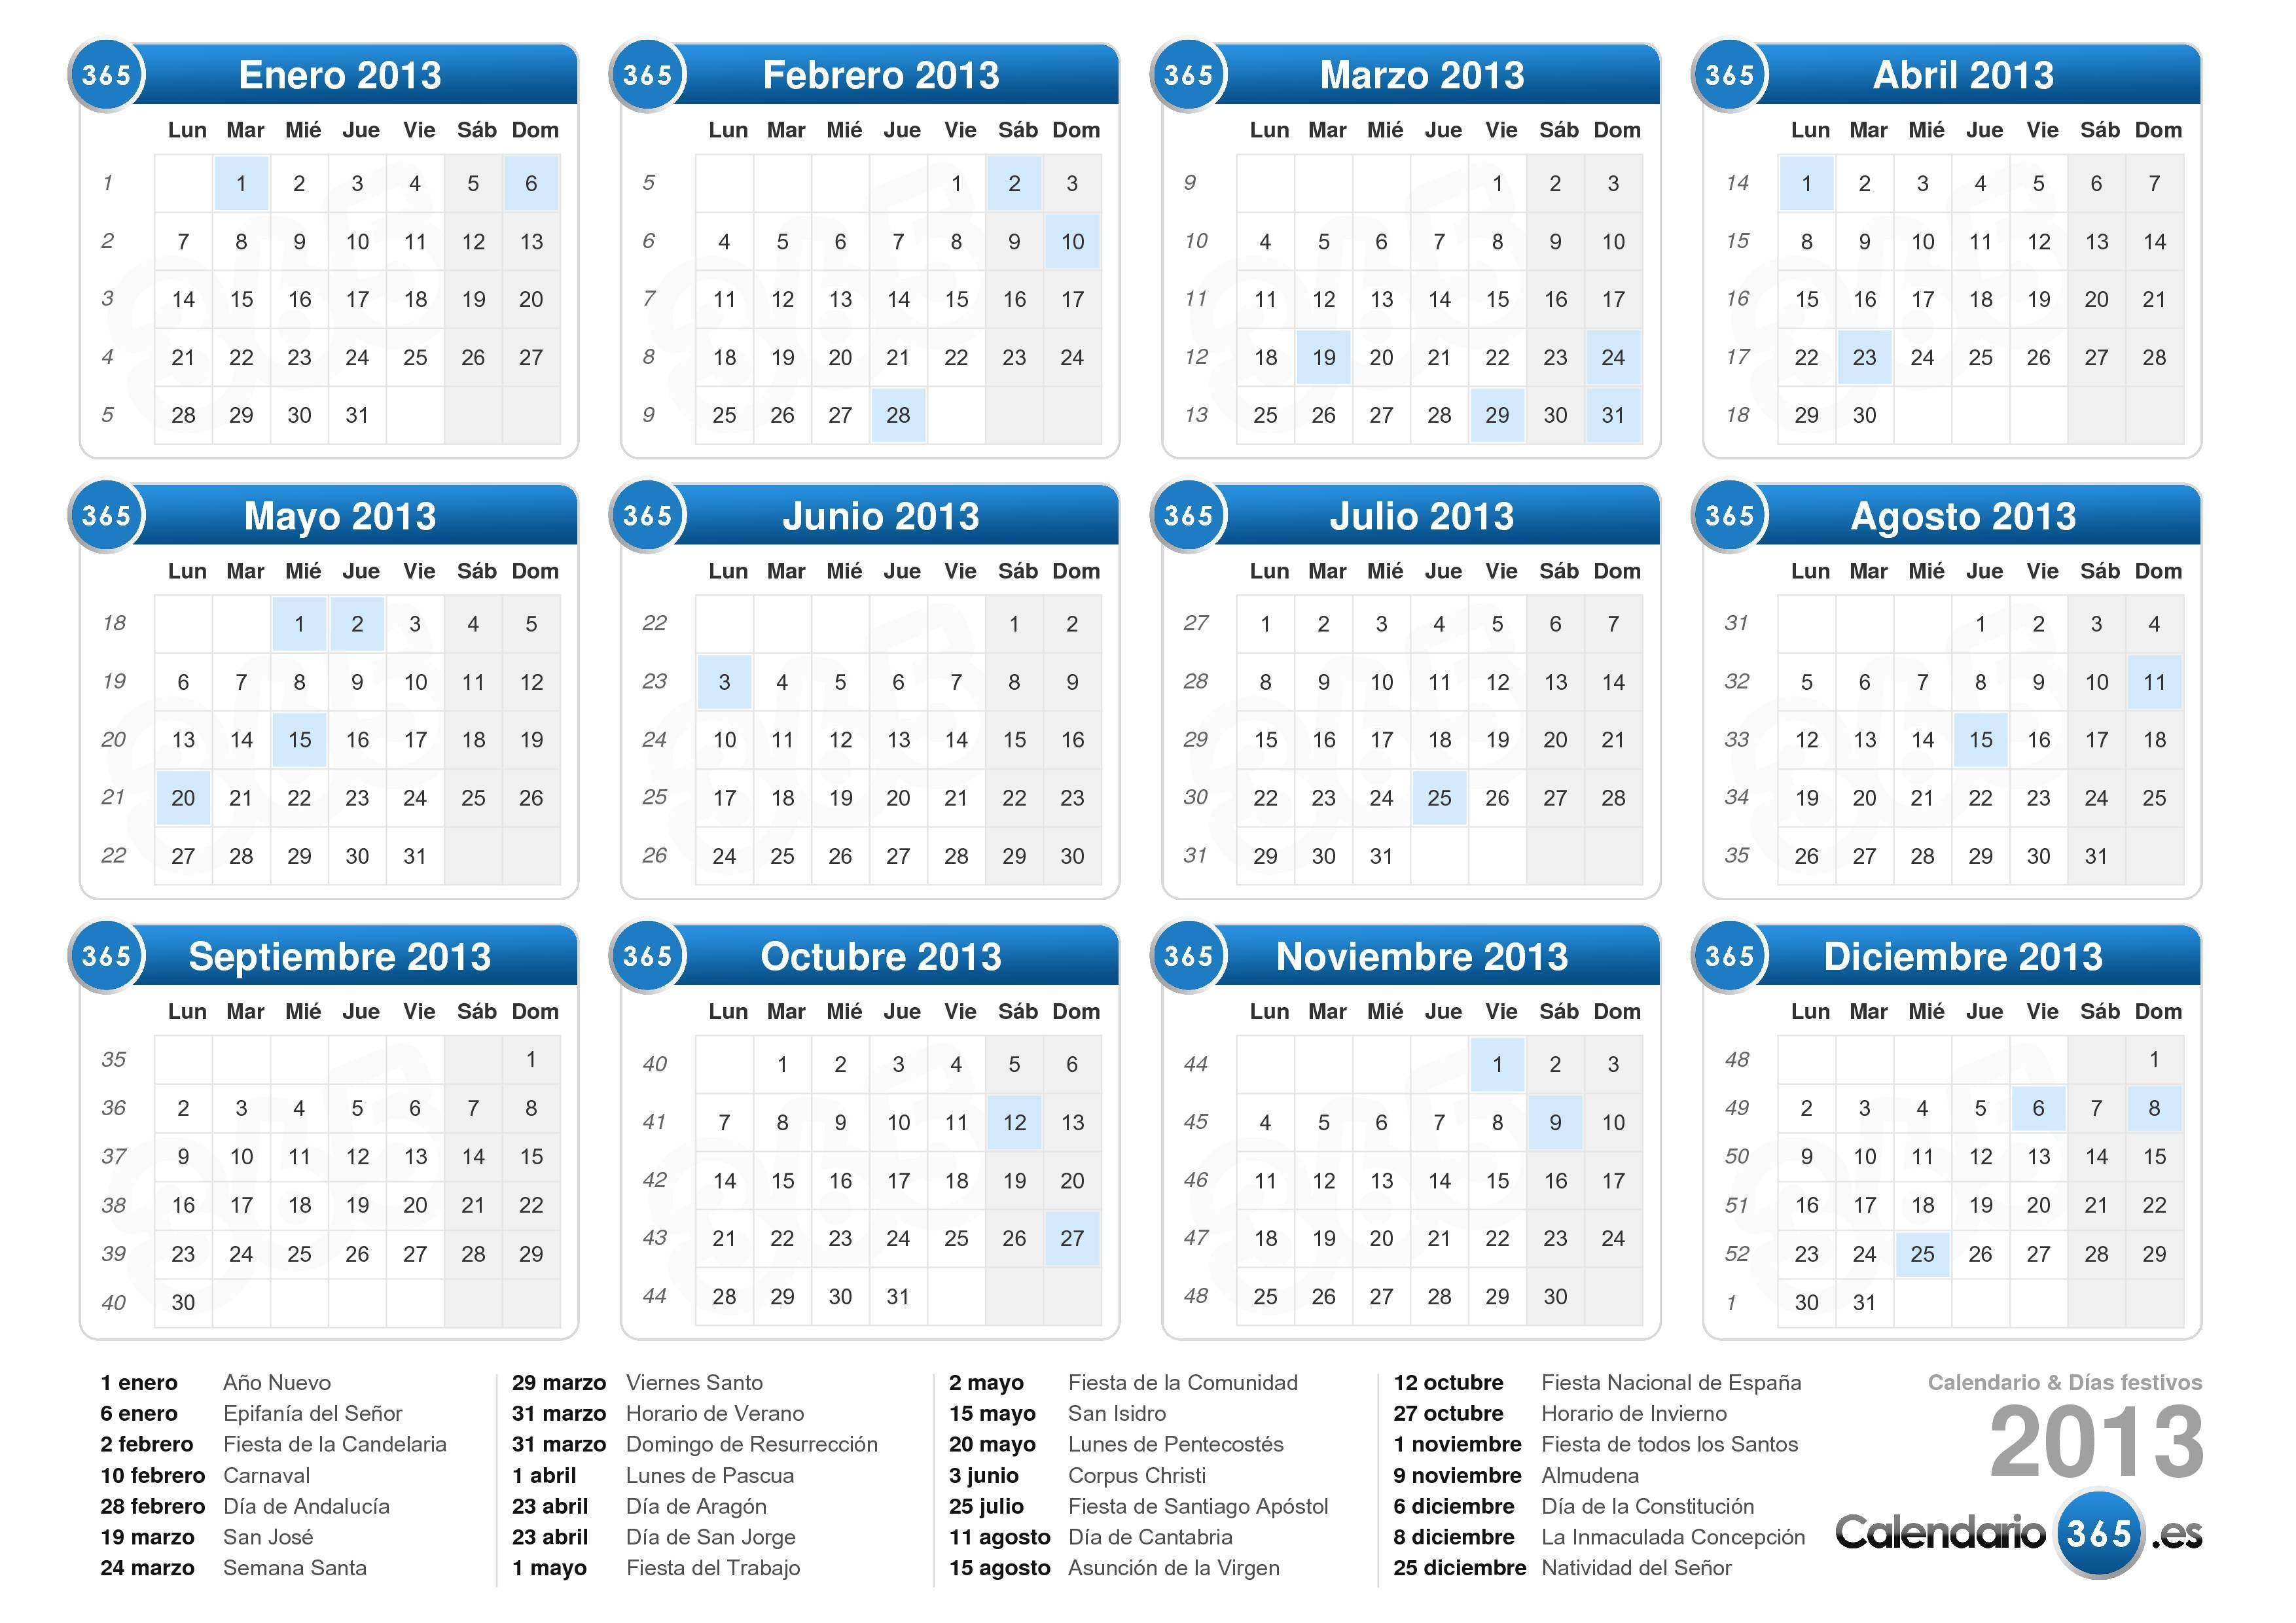 Calendario con foto 2013 para imprimir gratis 39